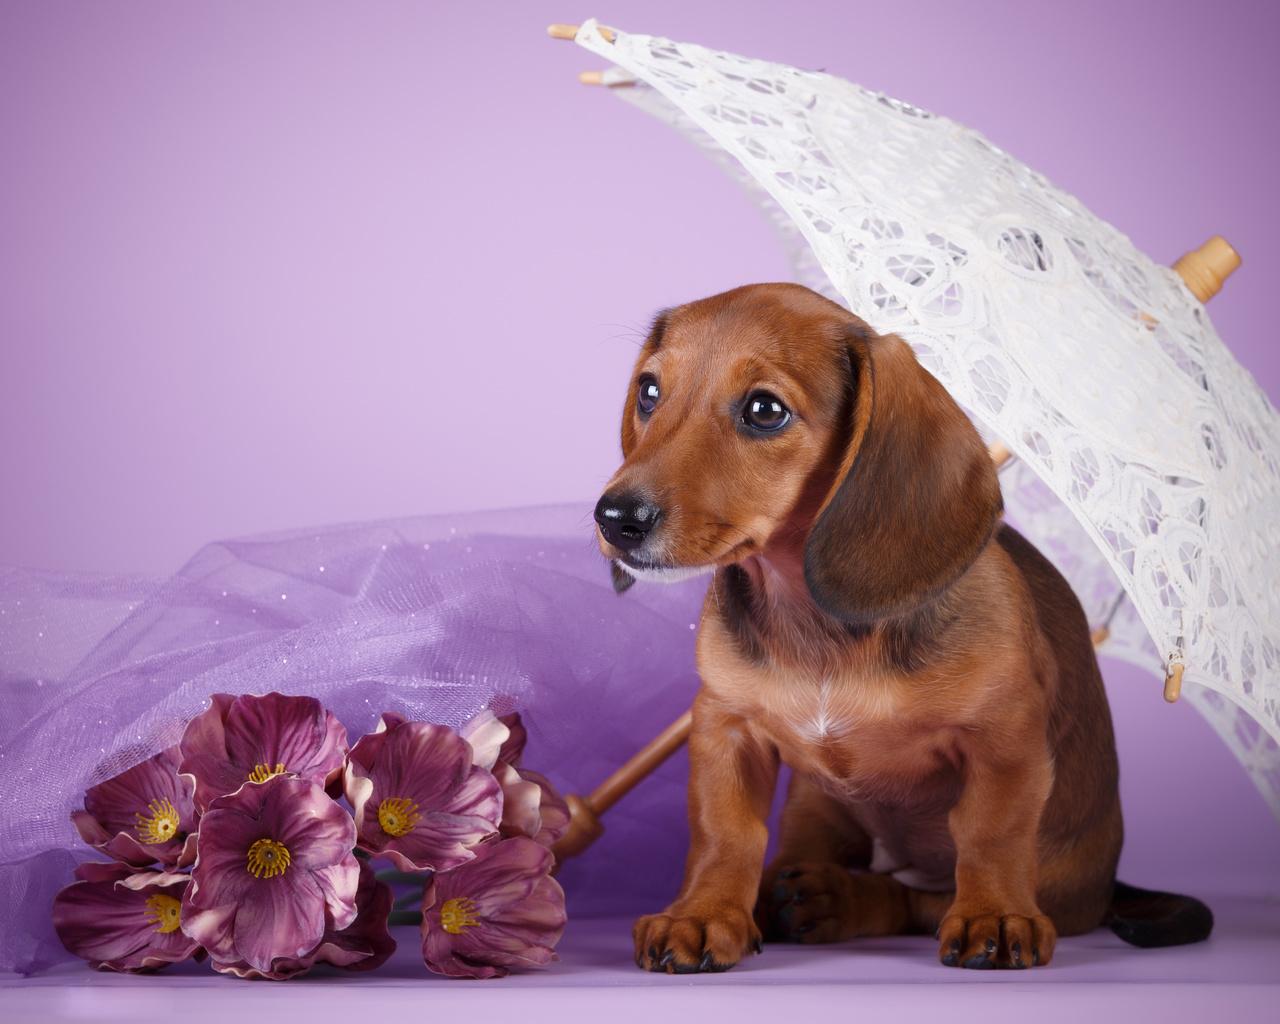 собака, пёс, щенок, такса, ткань, цветы, зонт